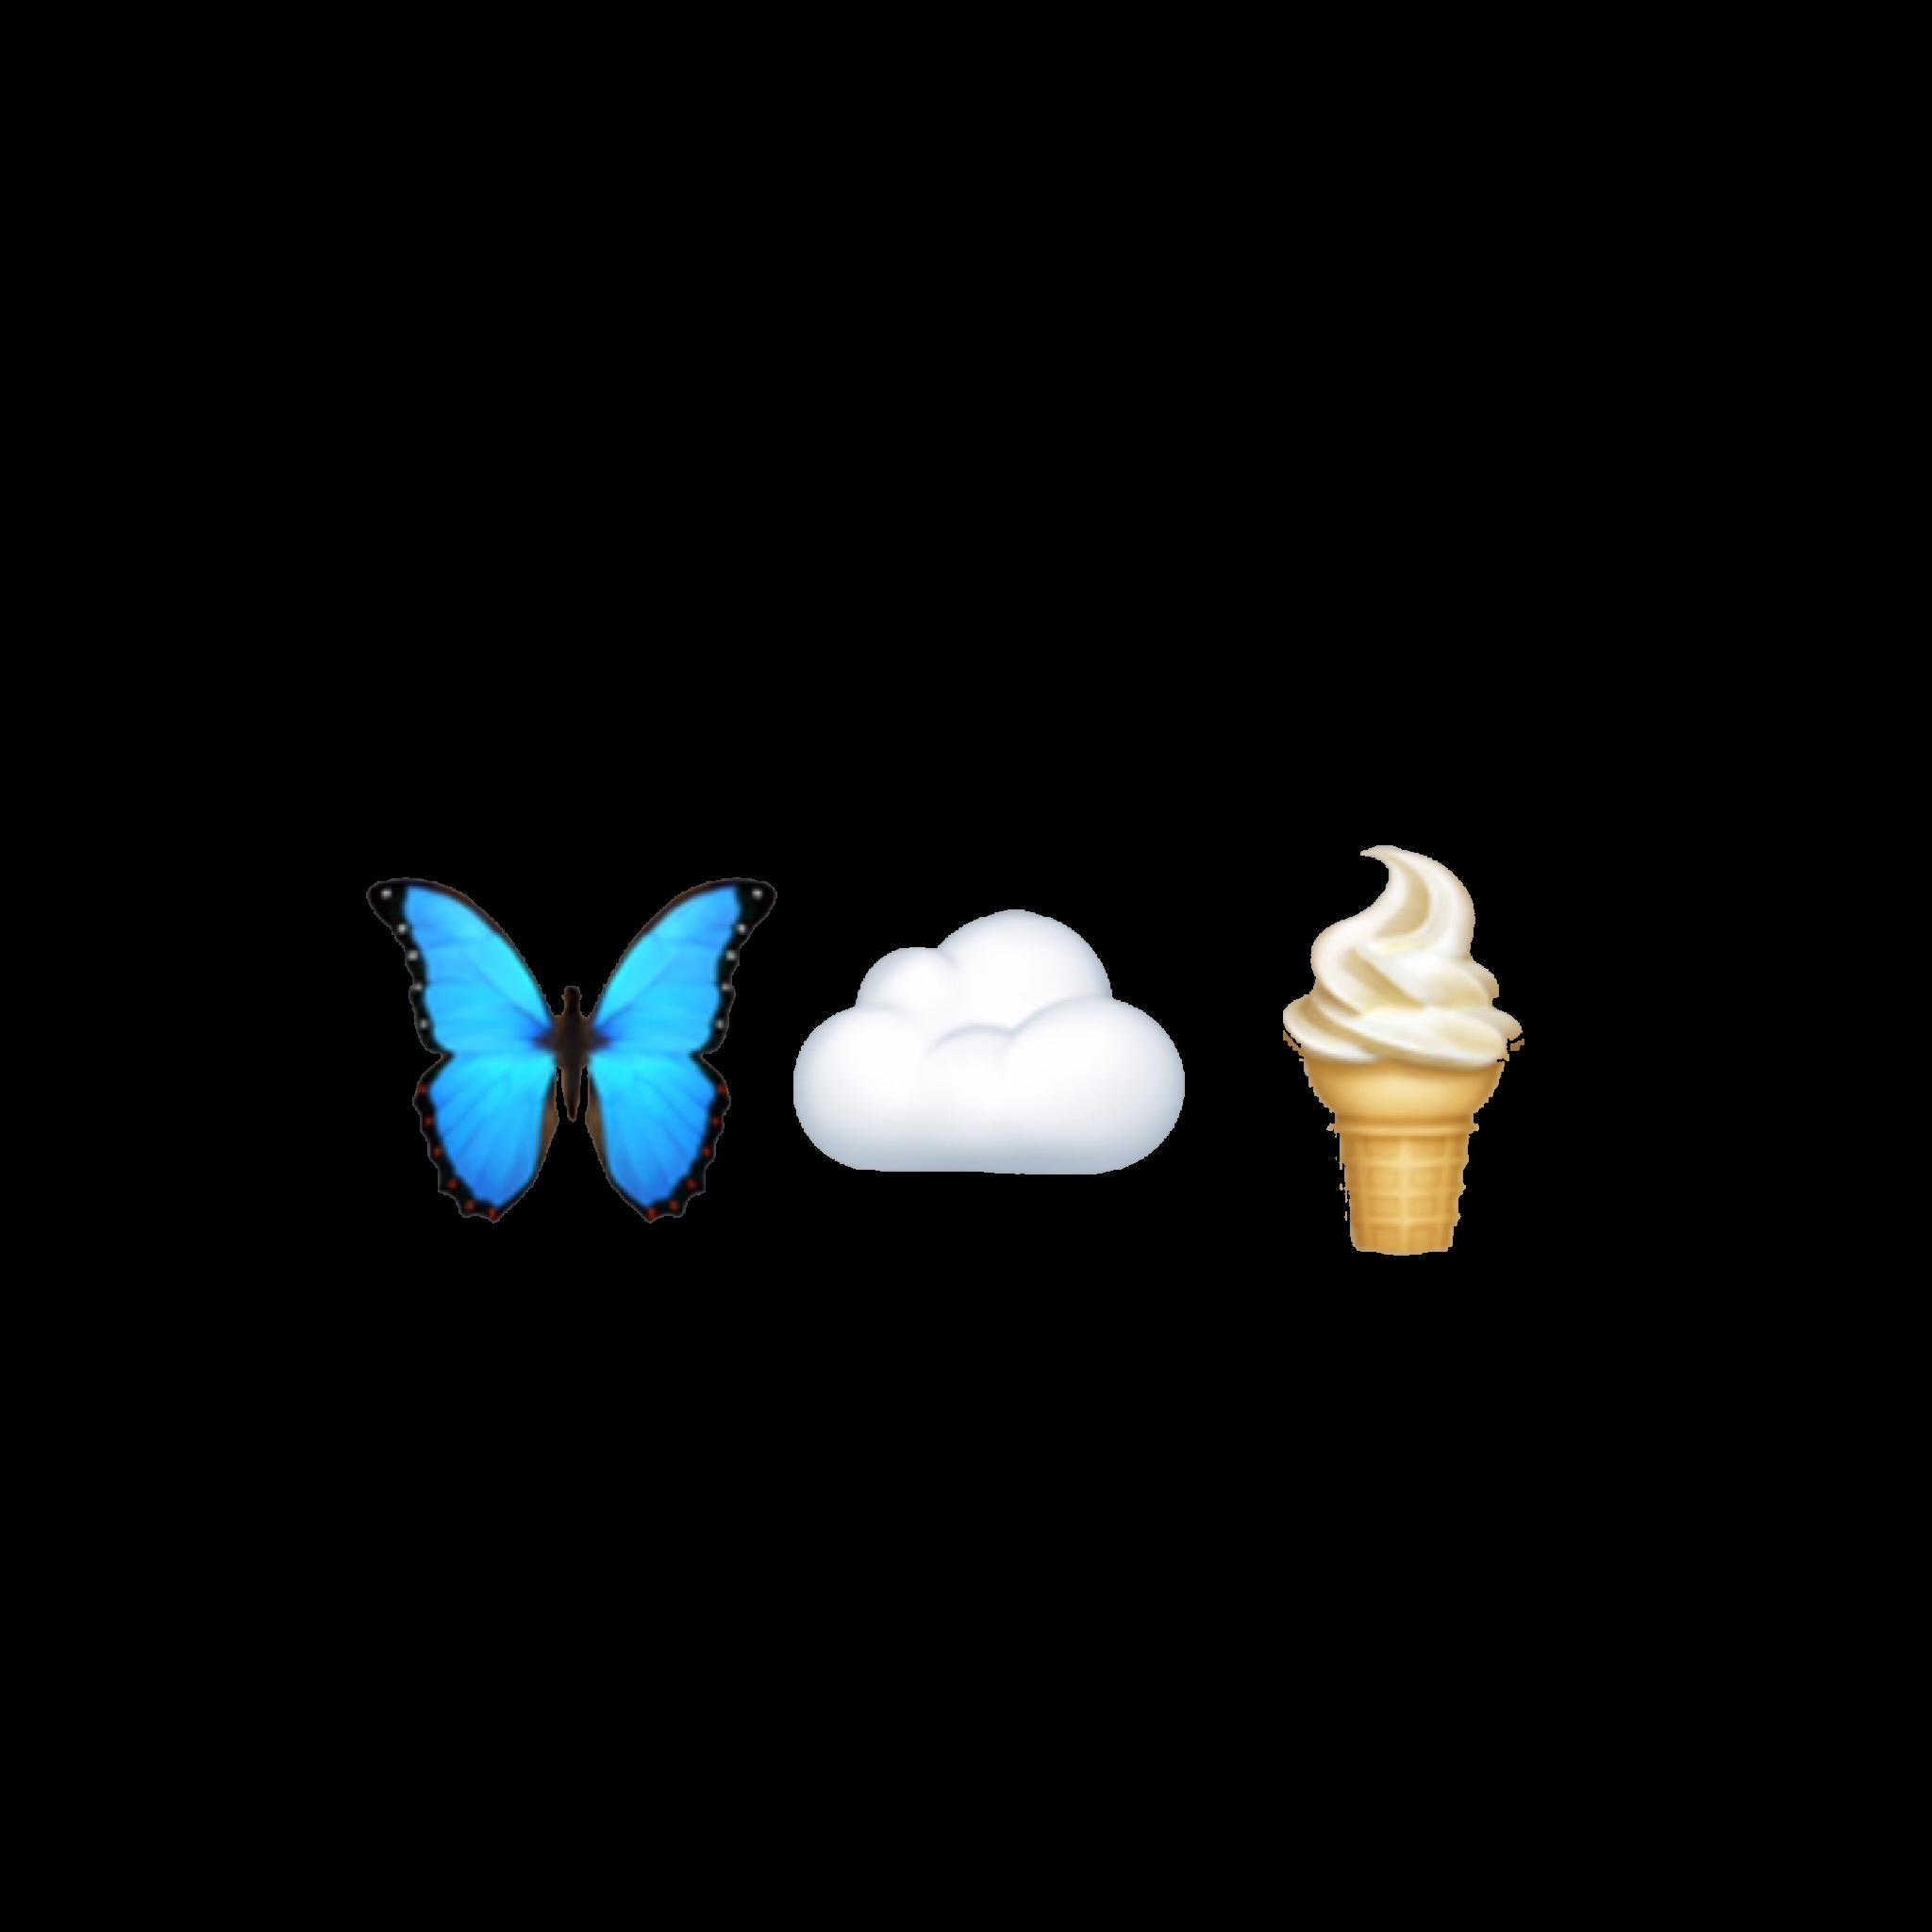 Soft Ice Cream Emoji Iphone Wwwtollebildcom